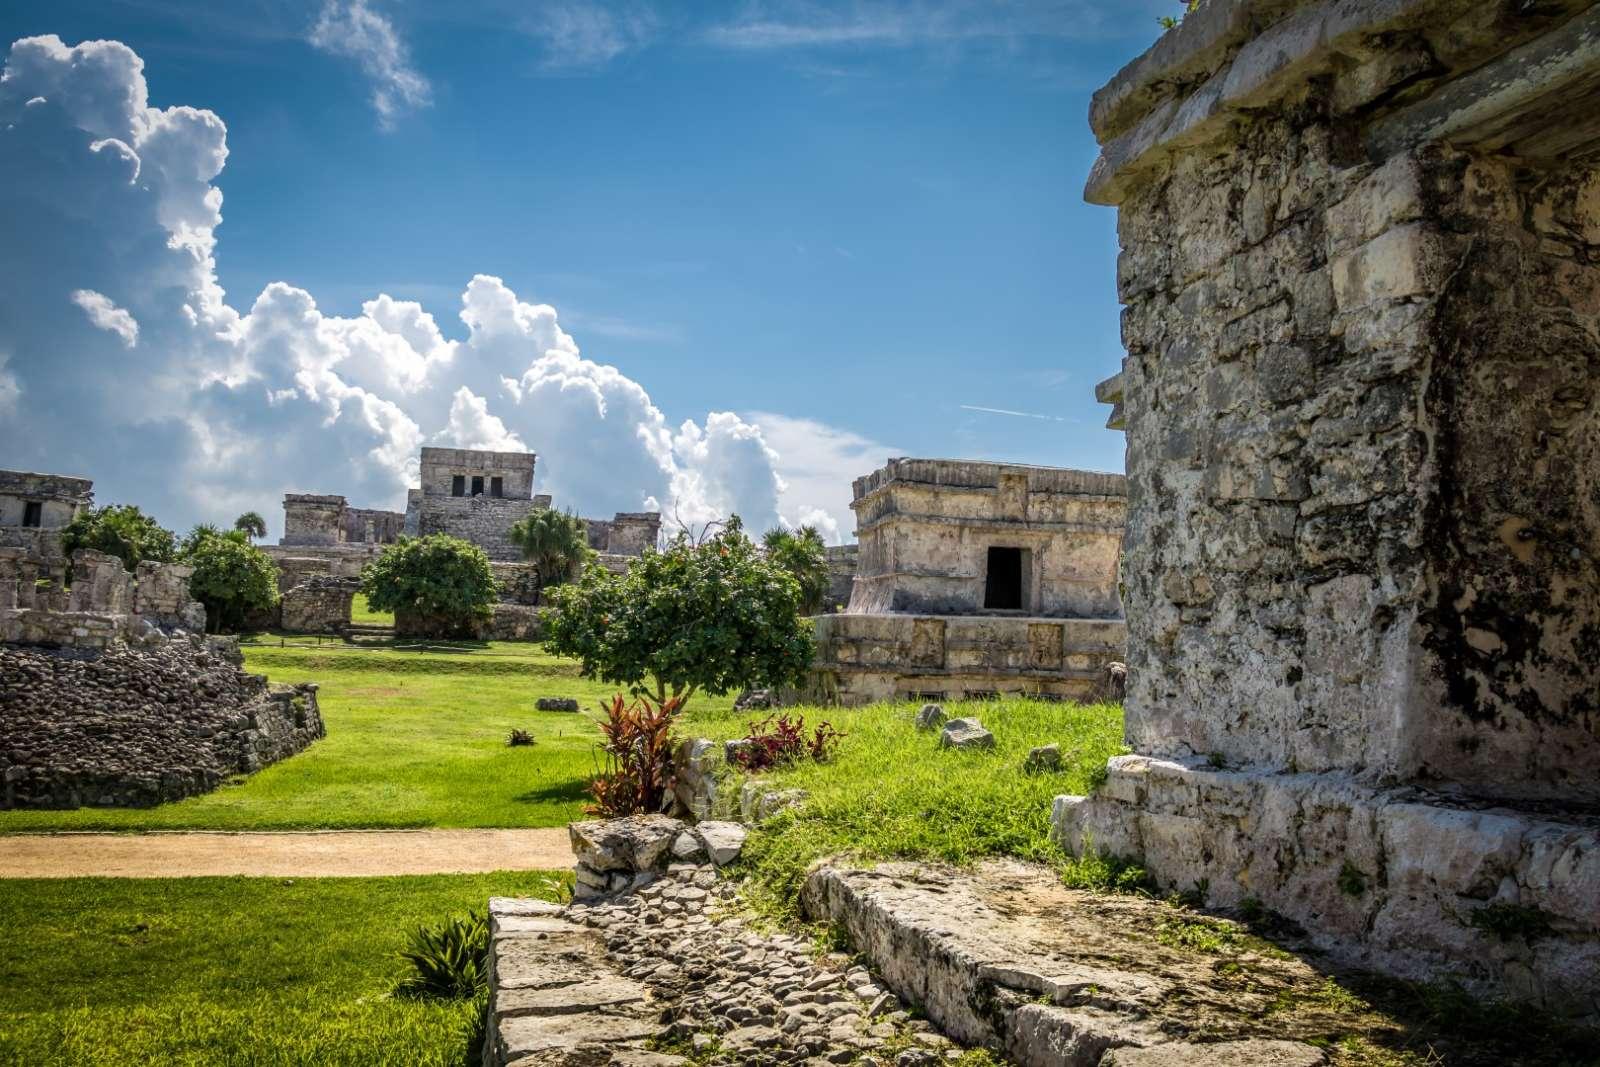 Ruinsof Tulum, Mexico